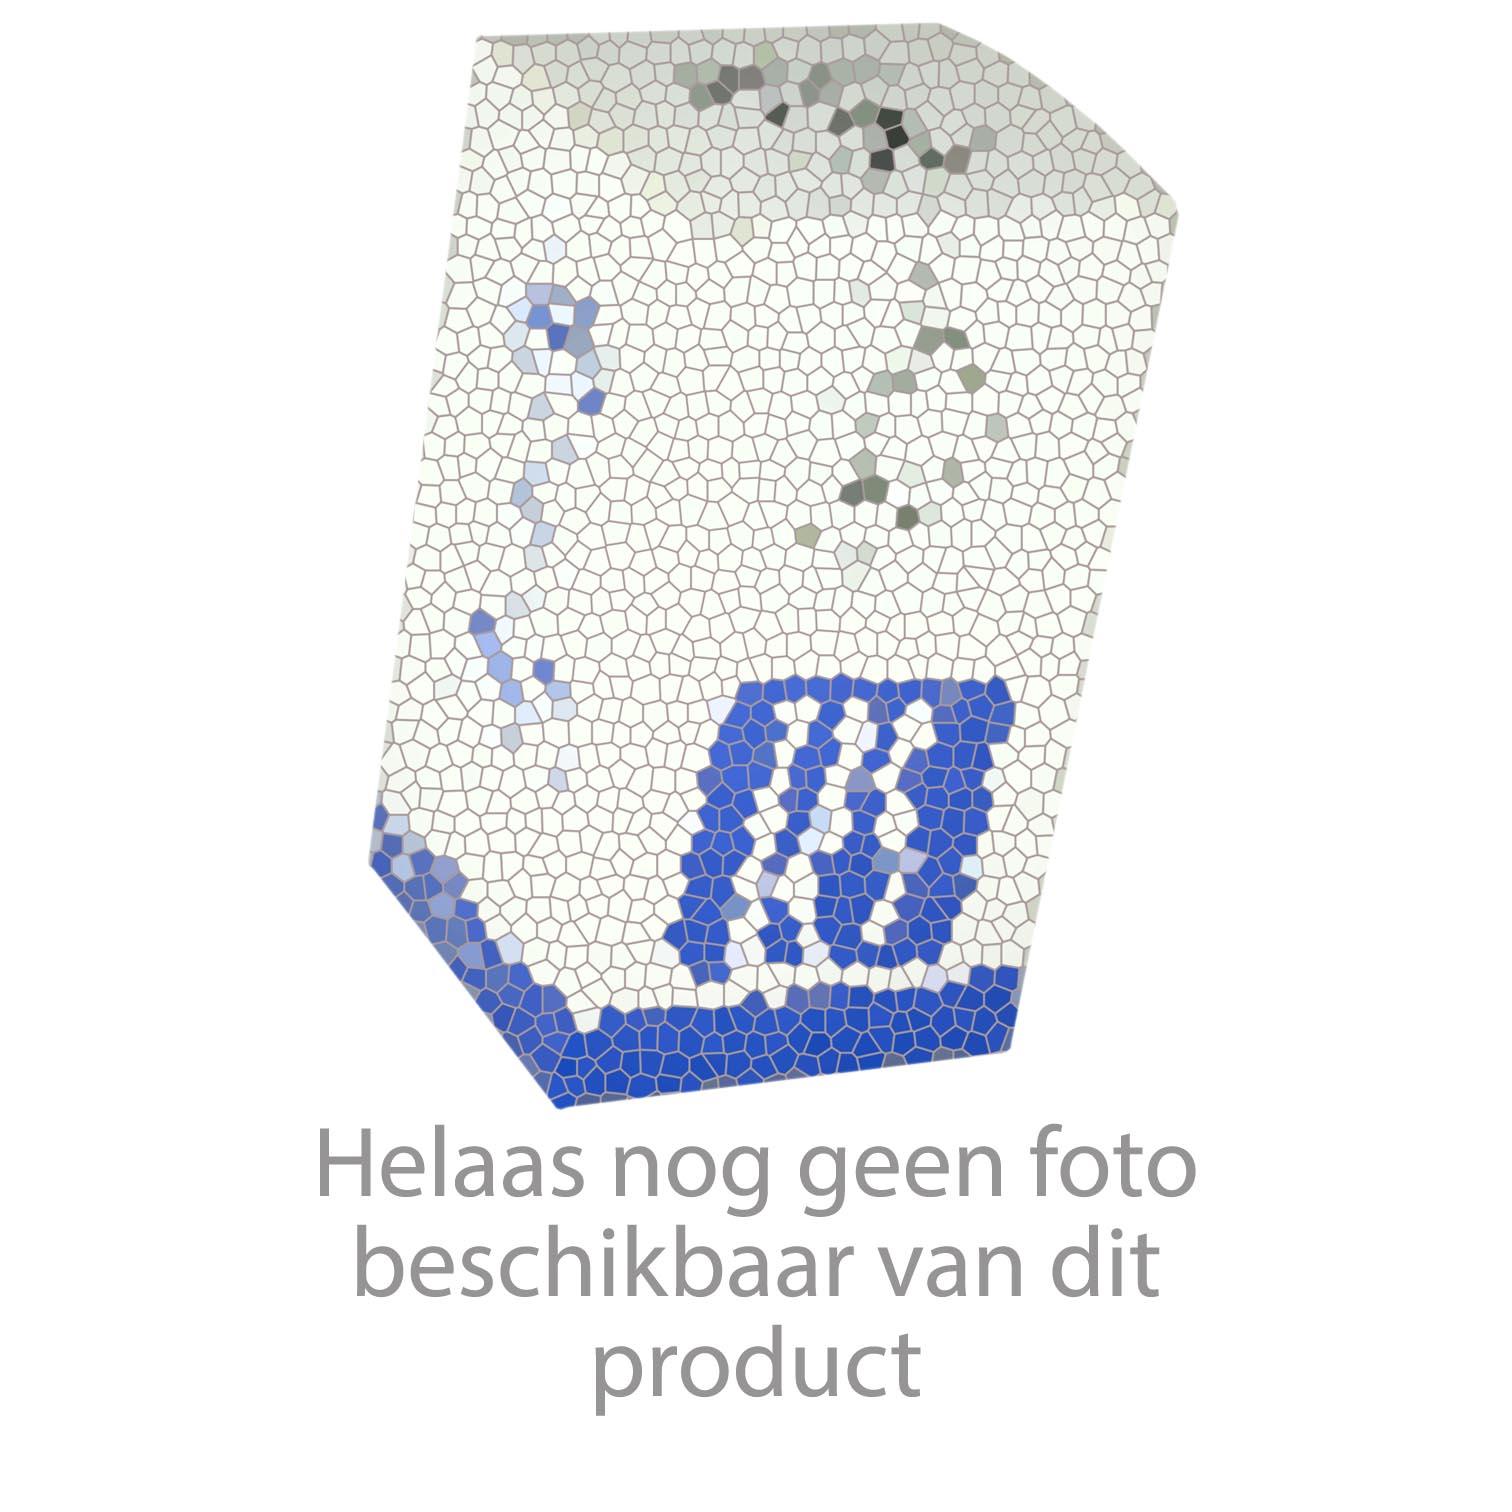 Grohe Allure Brilliant Wastafelmengkraan Hoog Gladde Body Artikelnummer 23112000